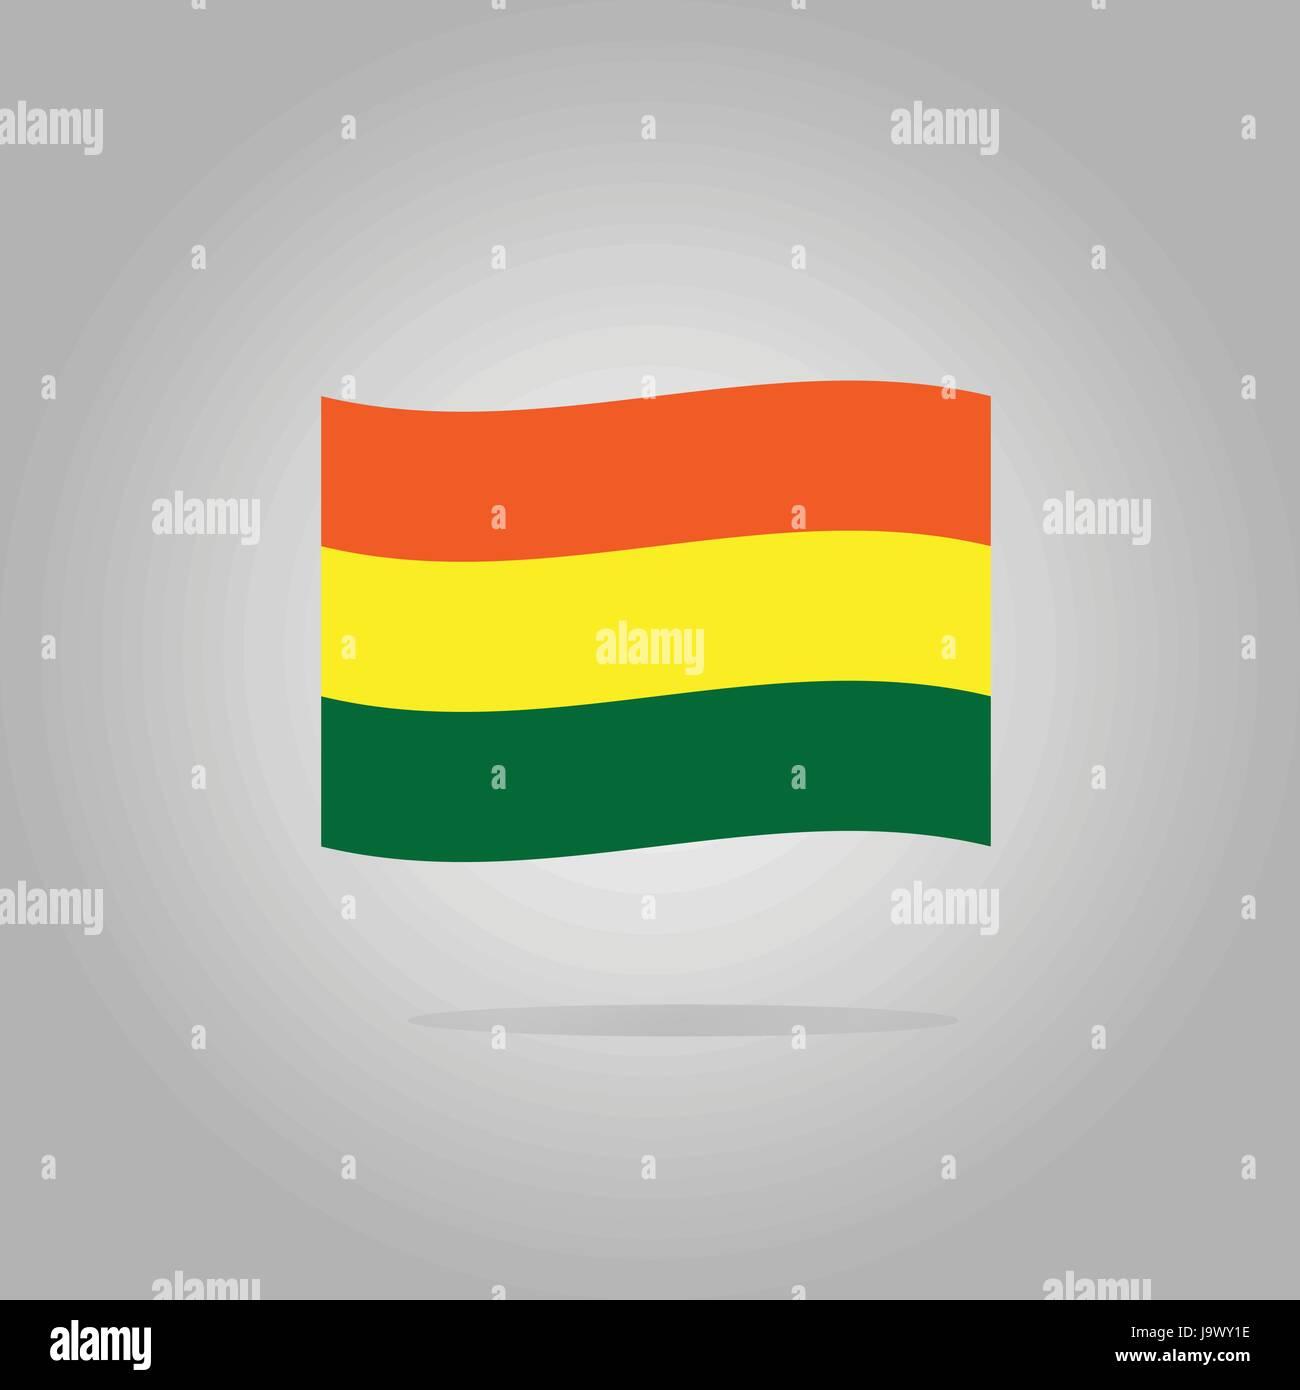 Bolivia flag design illustration - Stock Vector